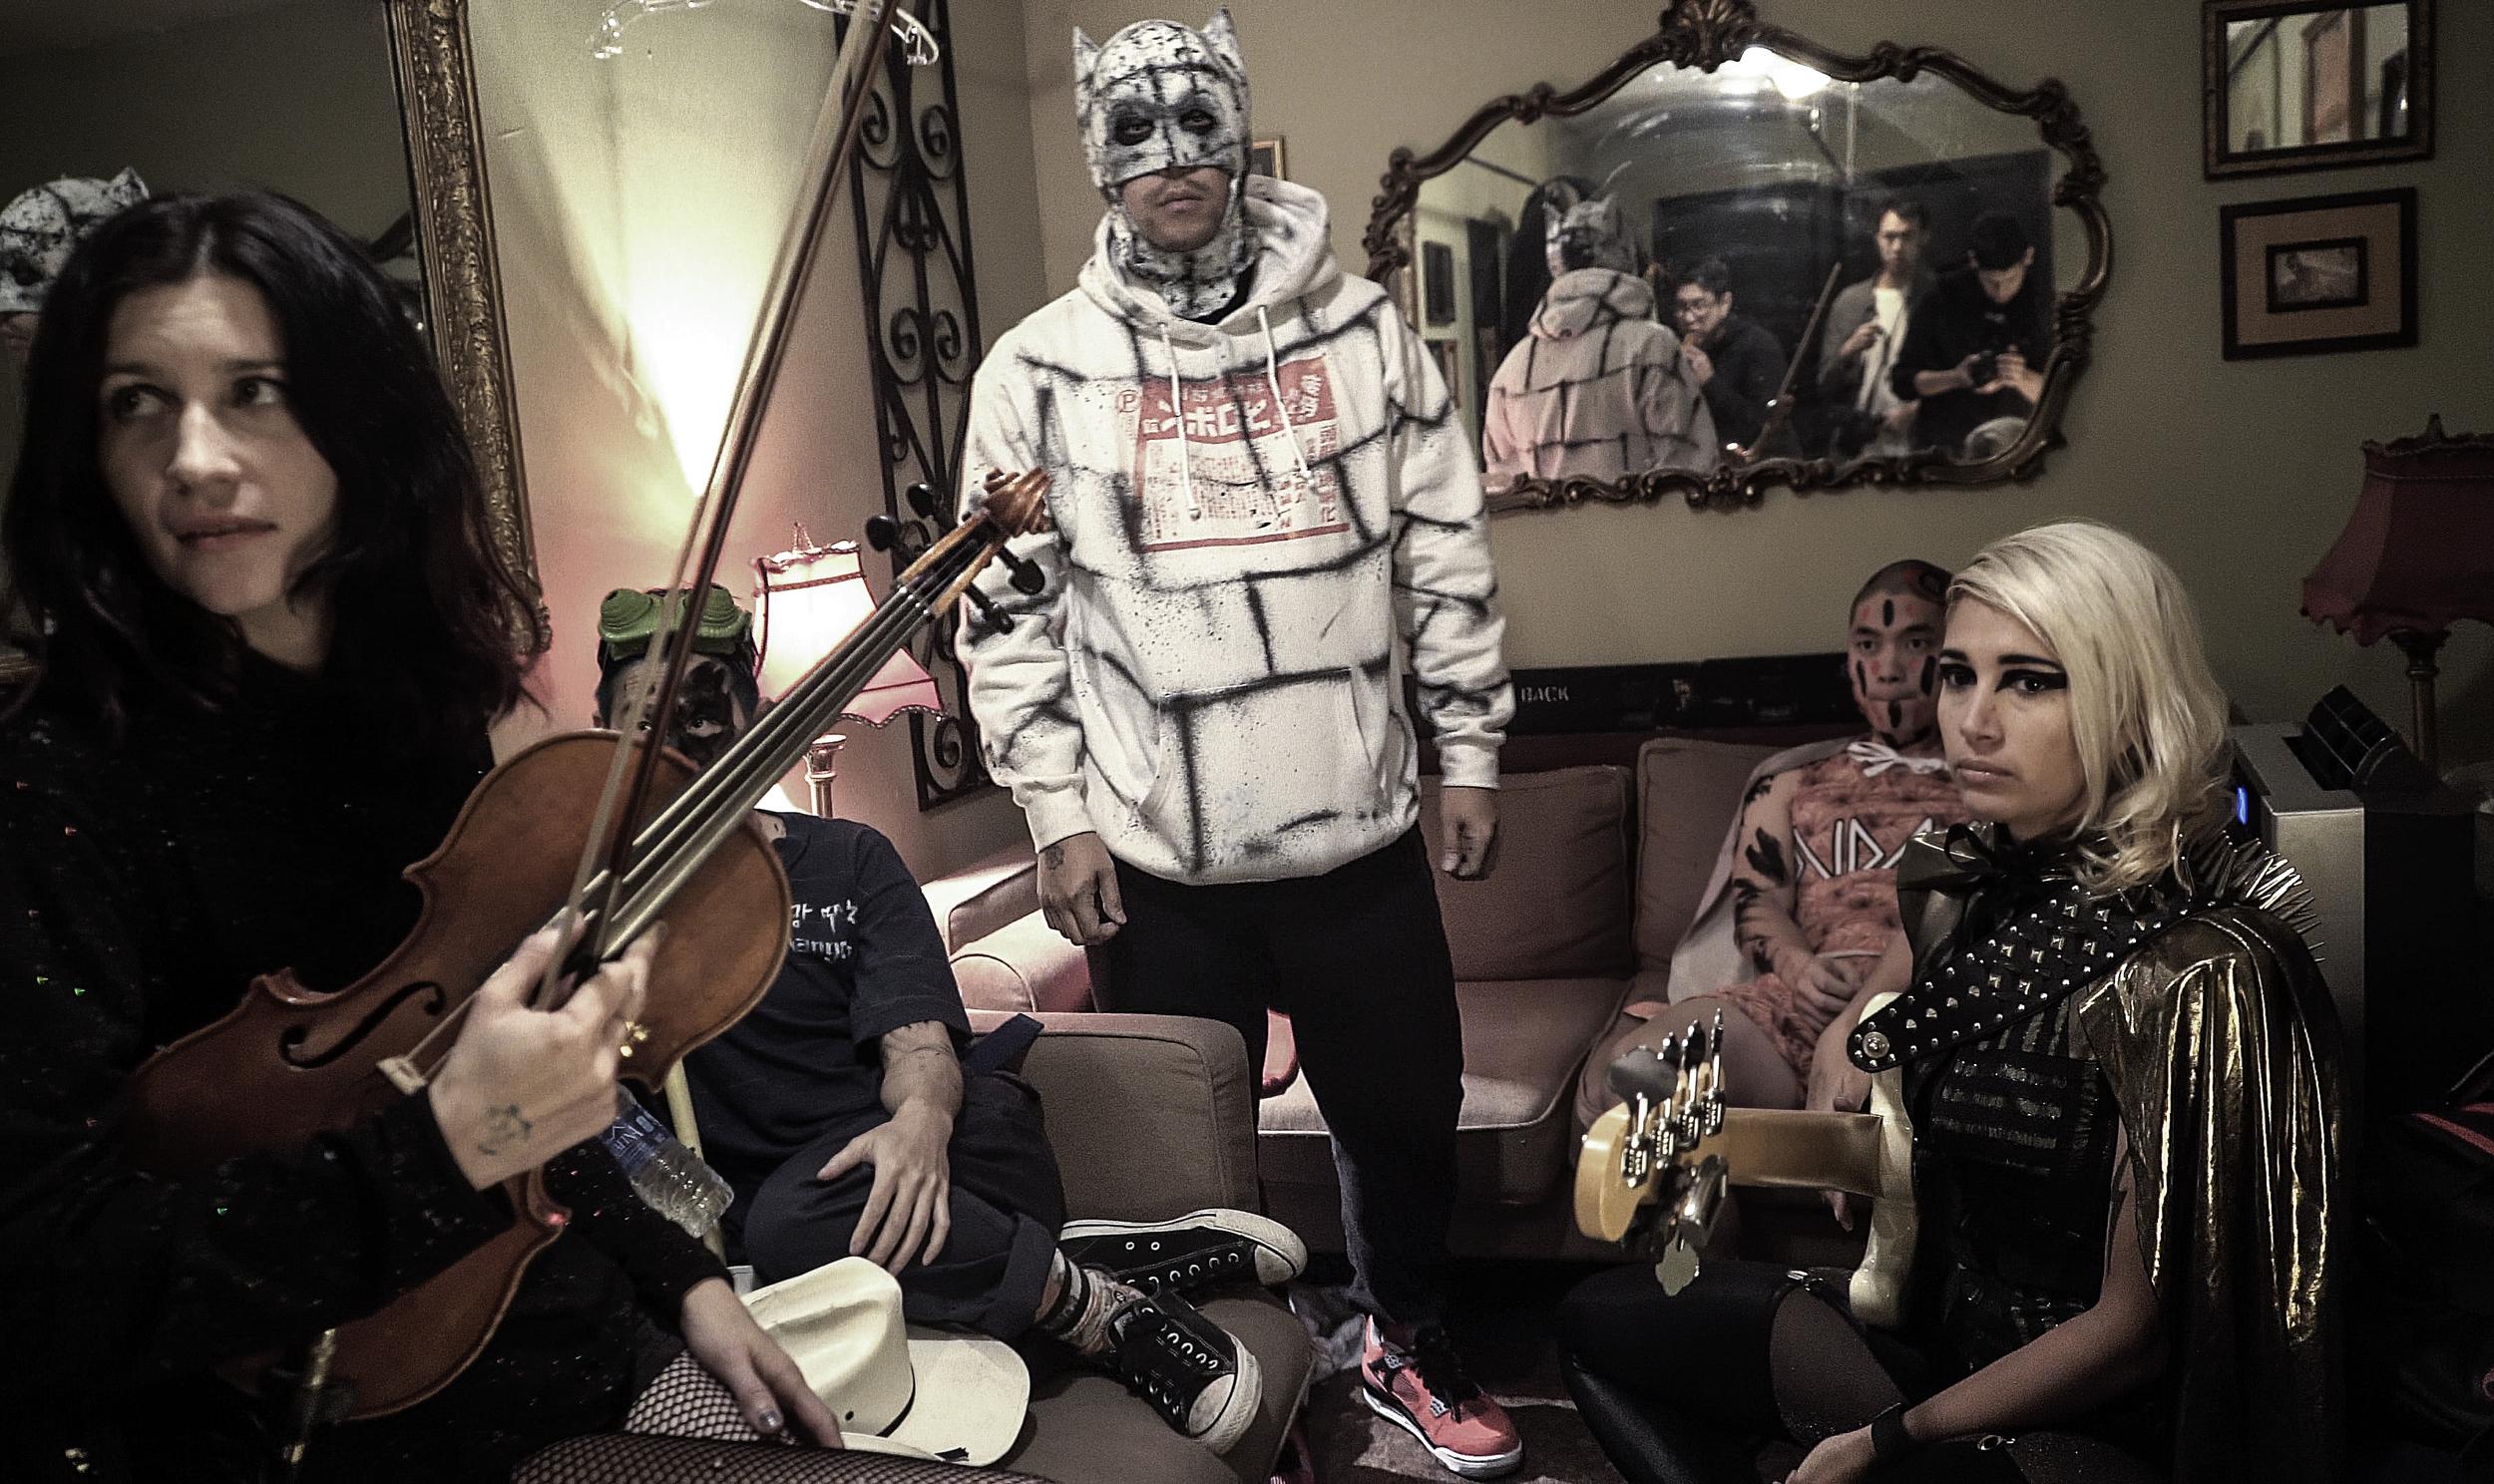 david-choe-mangchi-under-the-cobbletones-lulu-east-coast-tour-2016-tour-live-music-3.jpg